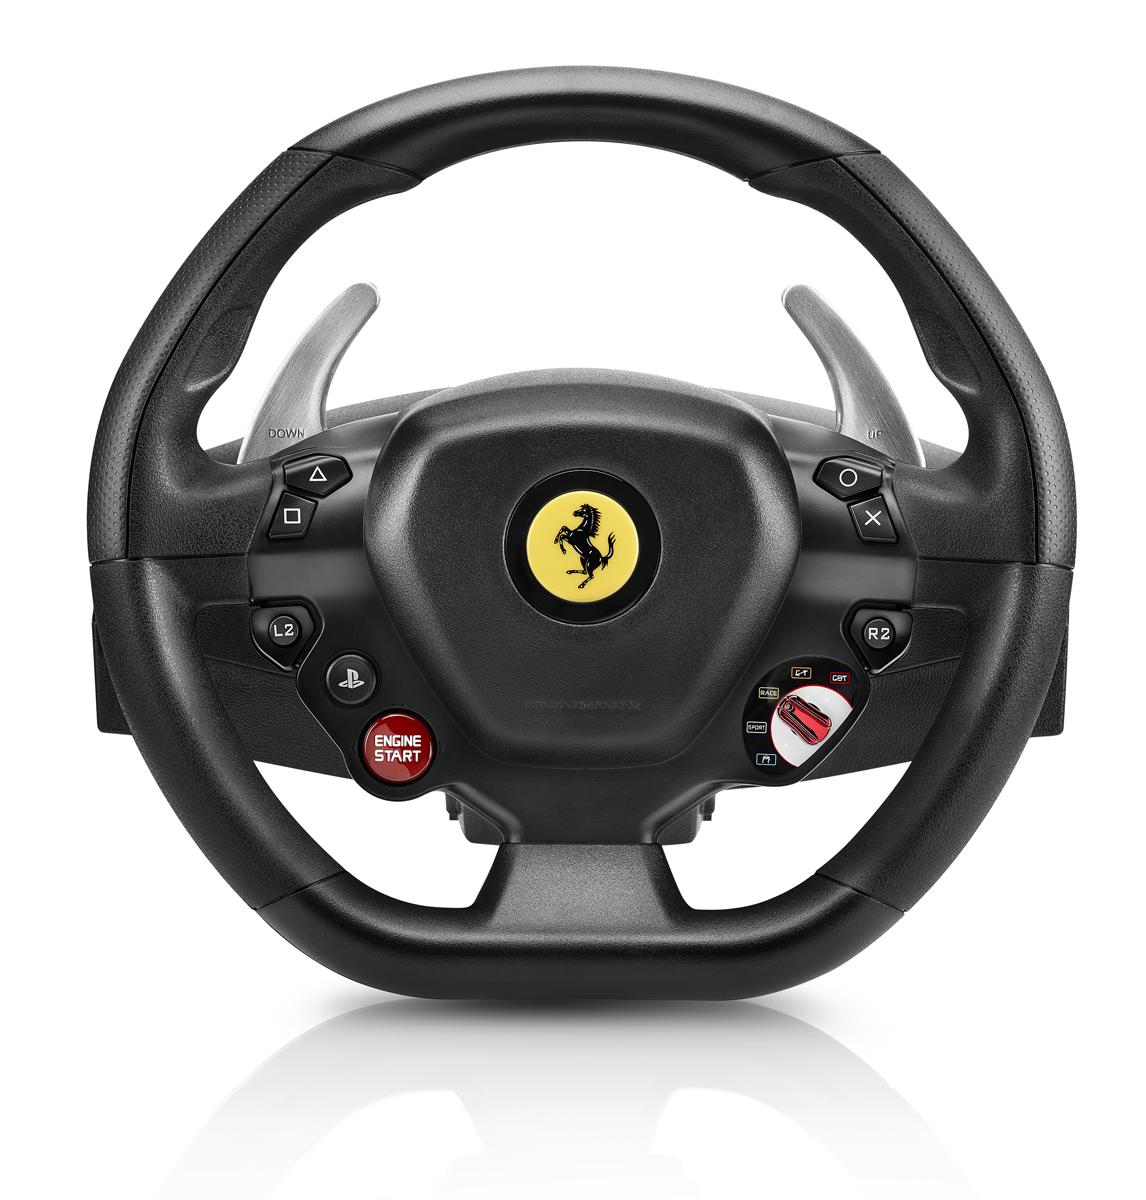 izmeritelplus.ru Thrustmaster T80 Ferrari 488 GTB Edition руль для PS4/PC